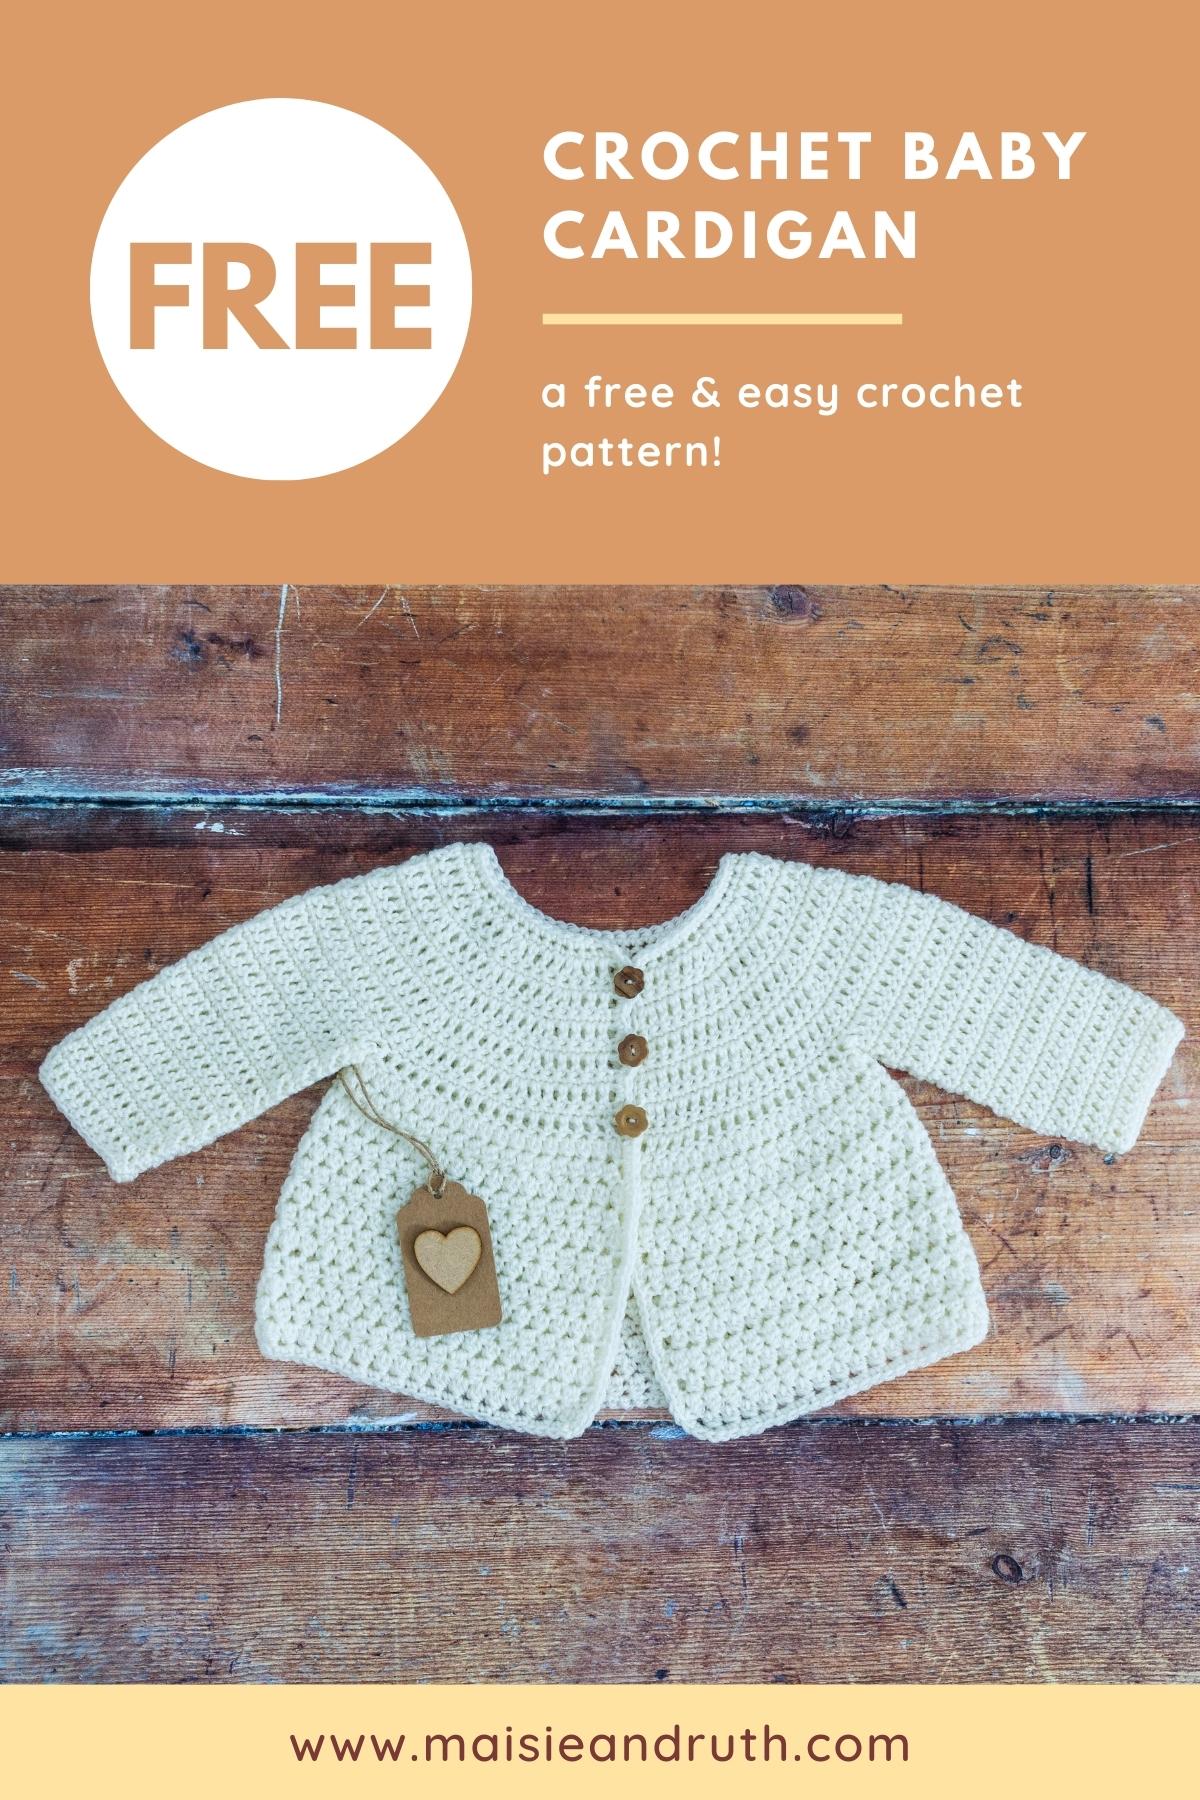 Crochet Baby Cardigan Free Crochet Pattern Pin 1